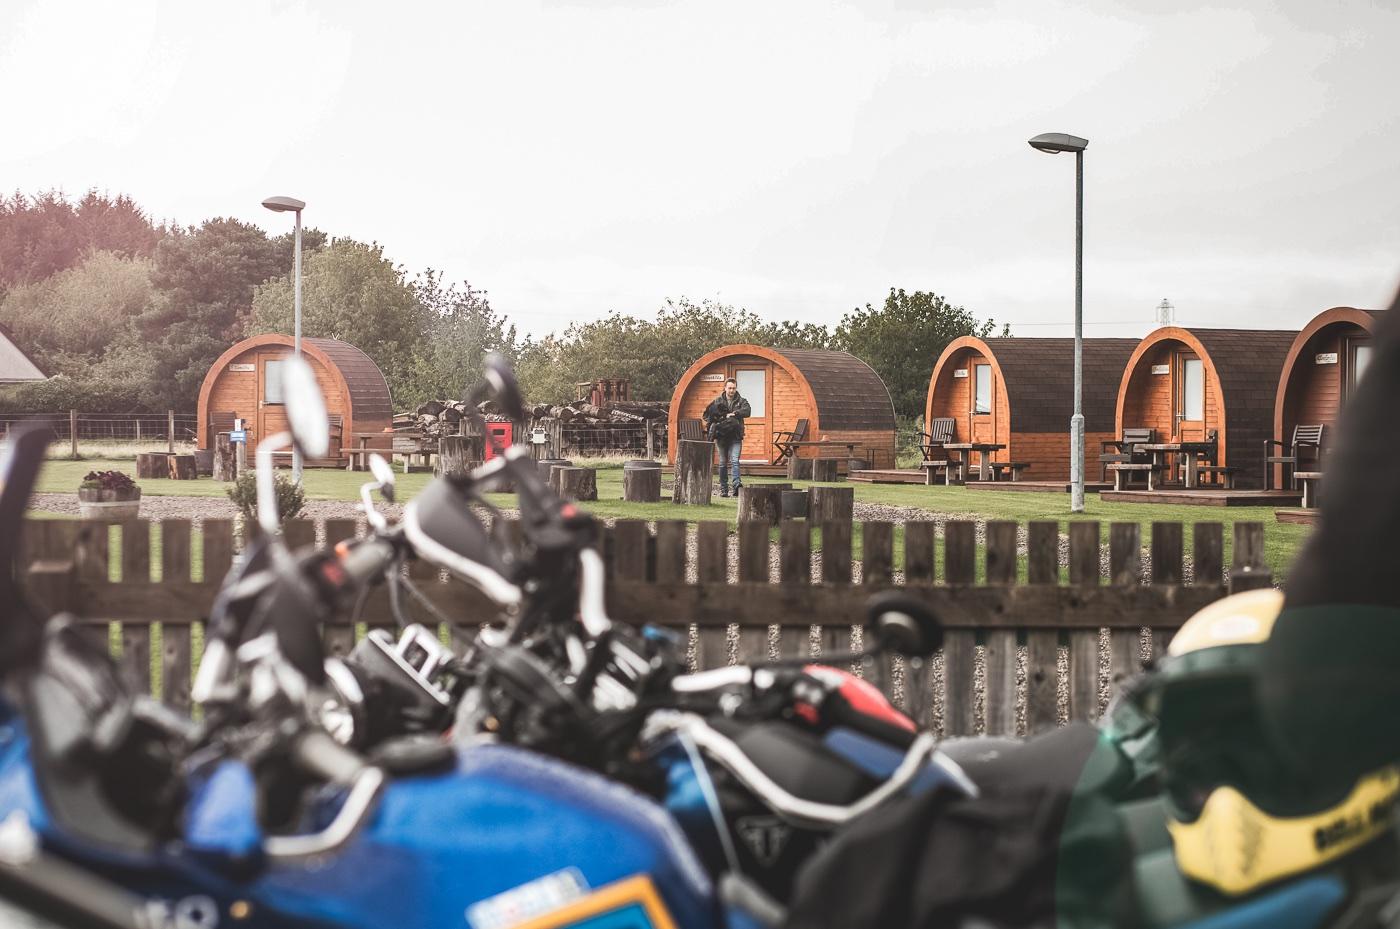 BikerBnB Host Accommodation